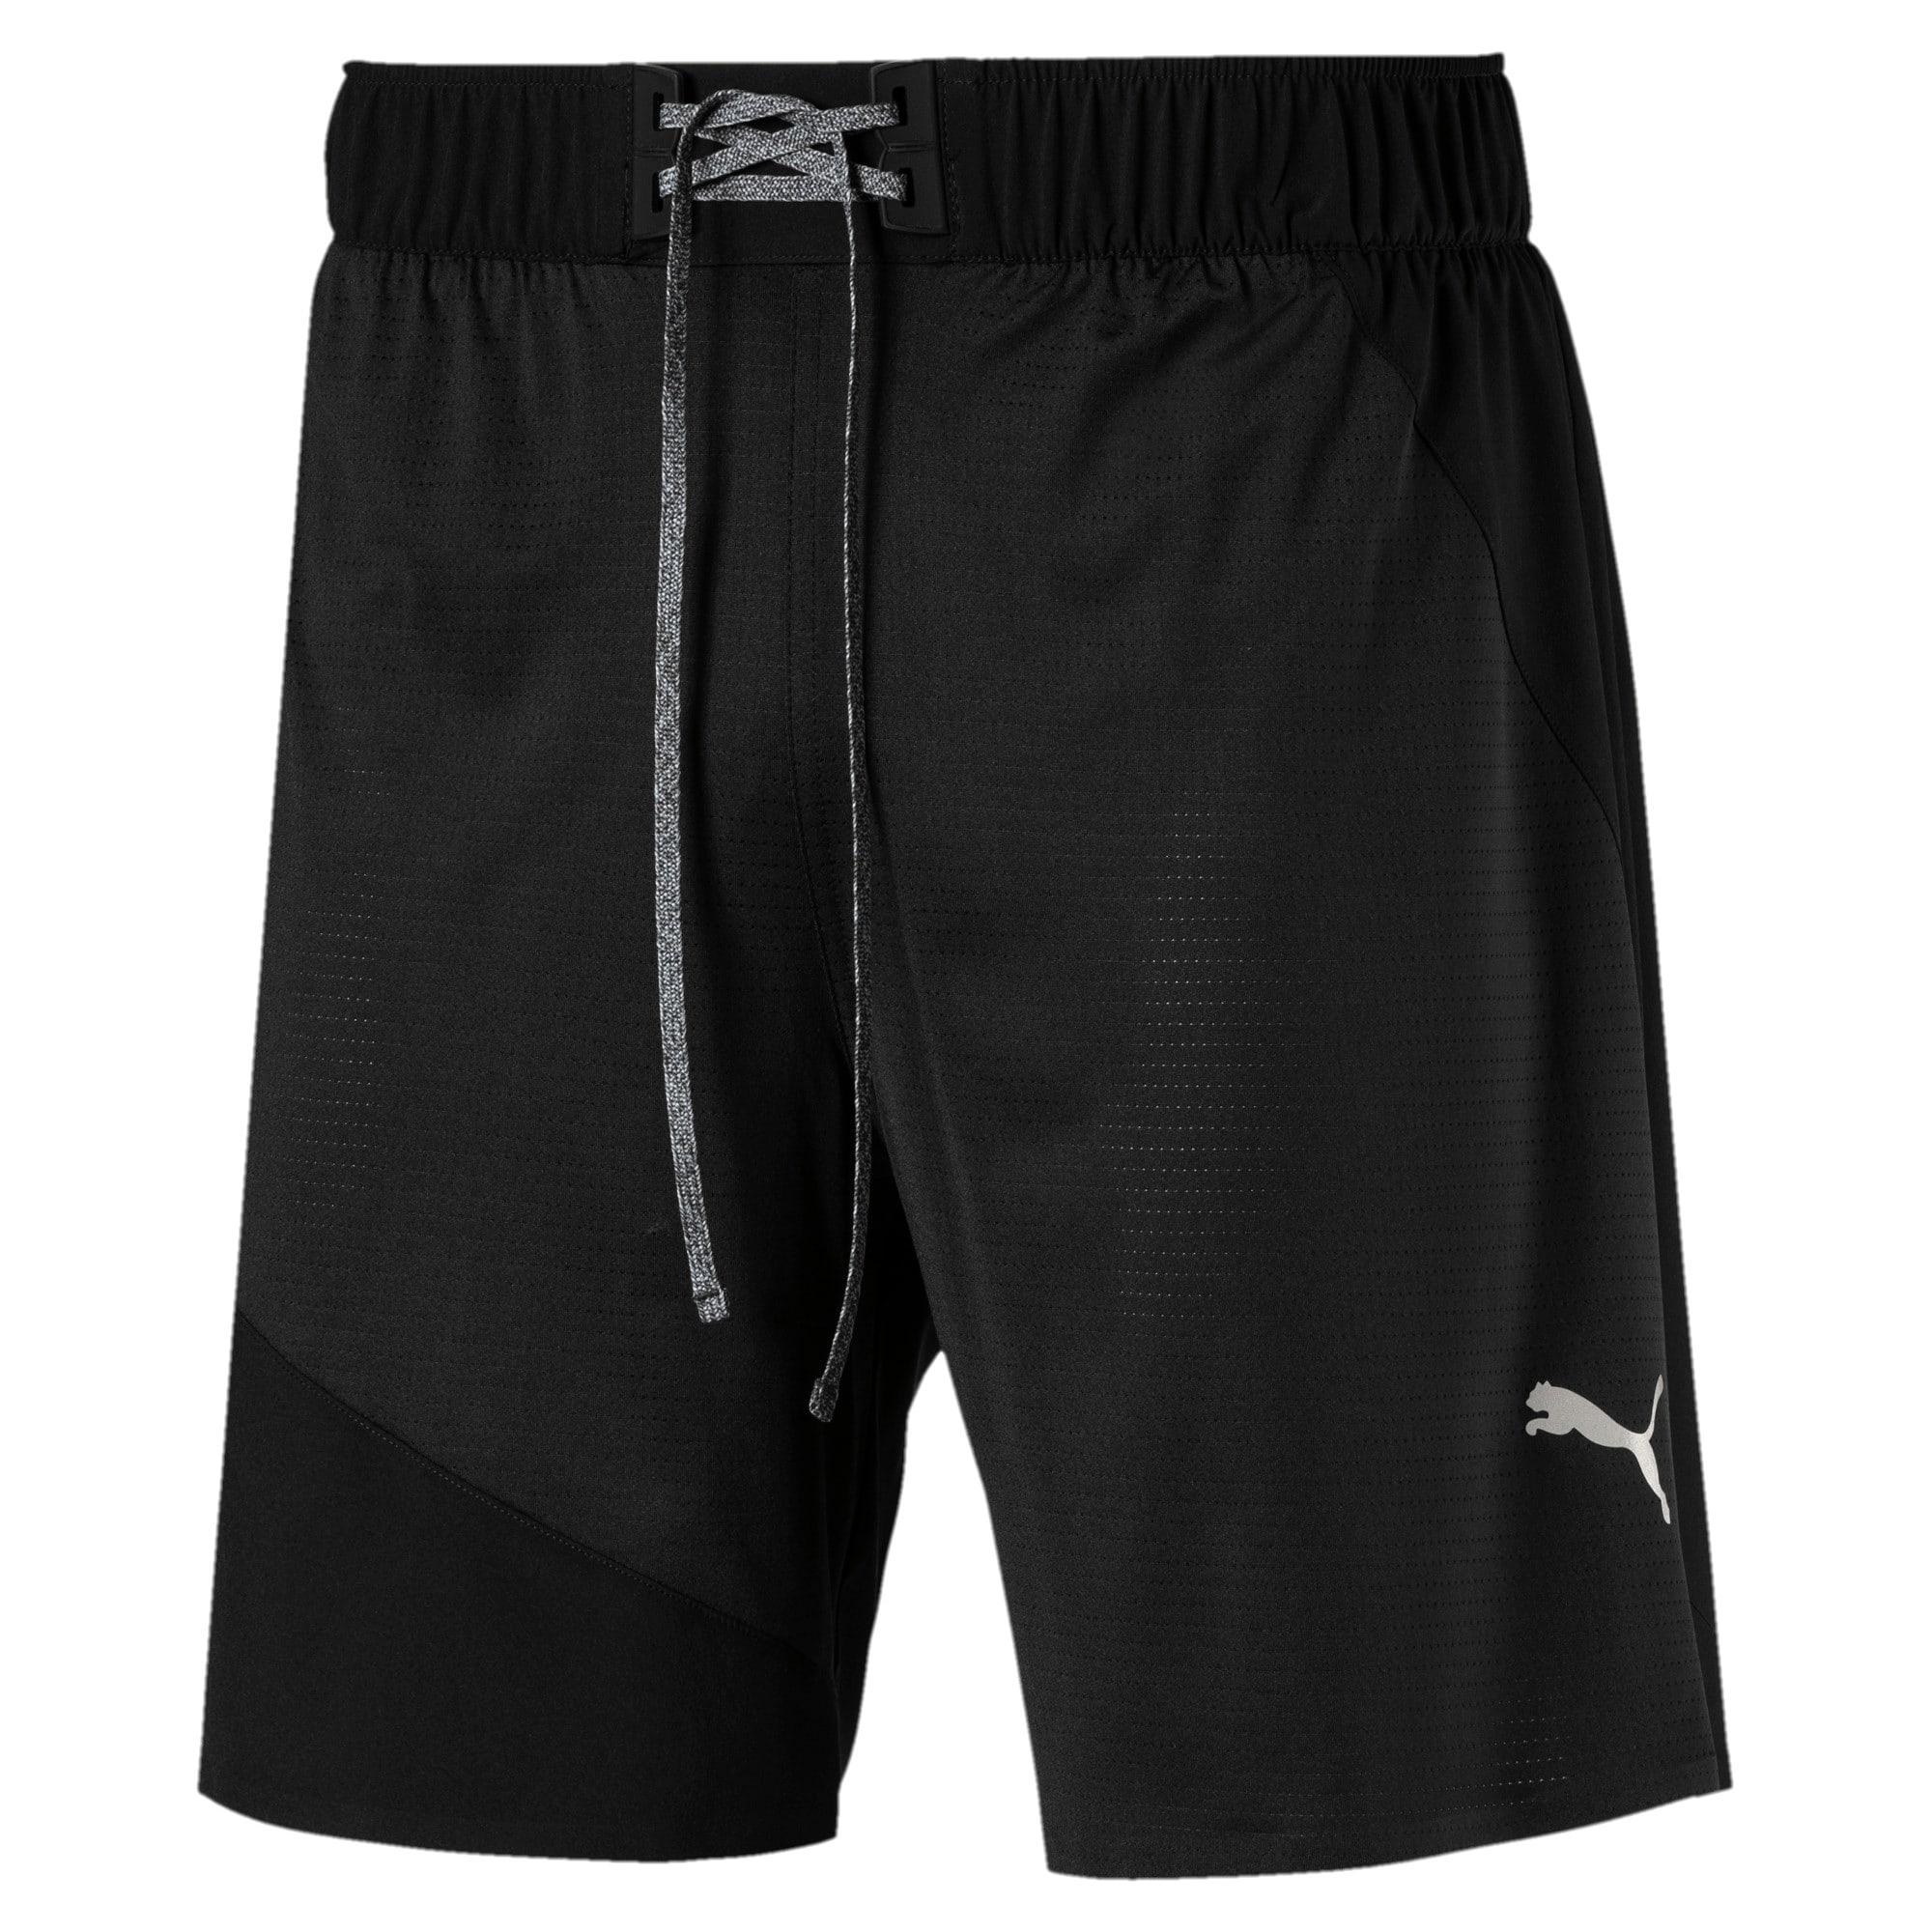 Thumbnail 4 of PACE Breeze Men's Shorts, Puma Black, medium